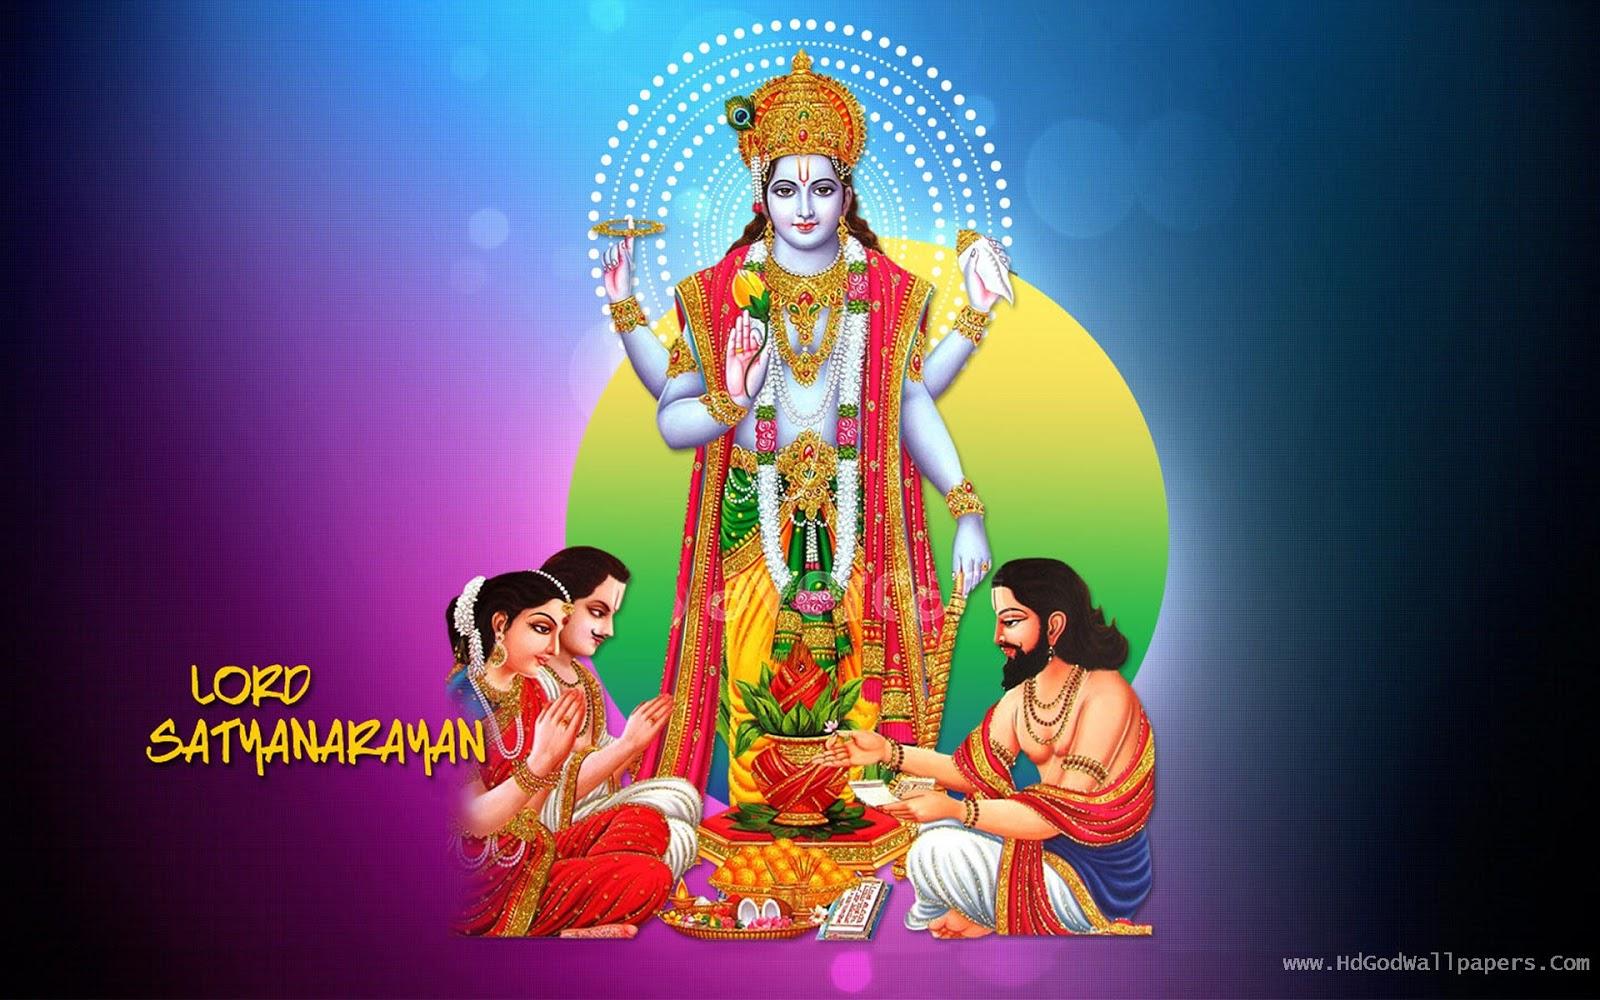 Lord Satyanarayana God Pictures